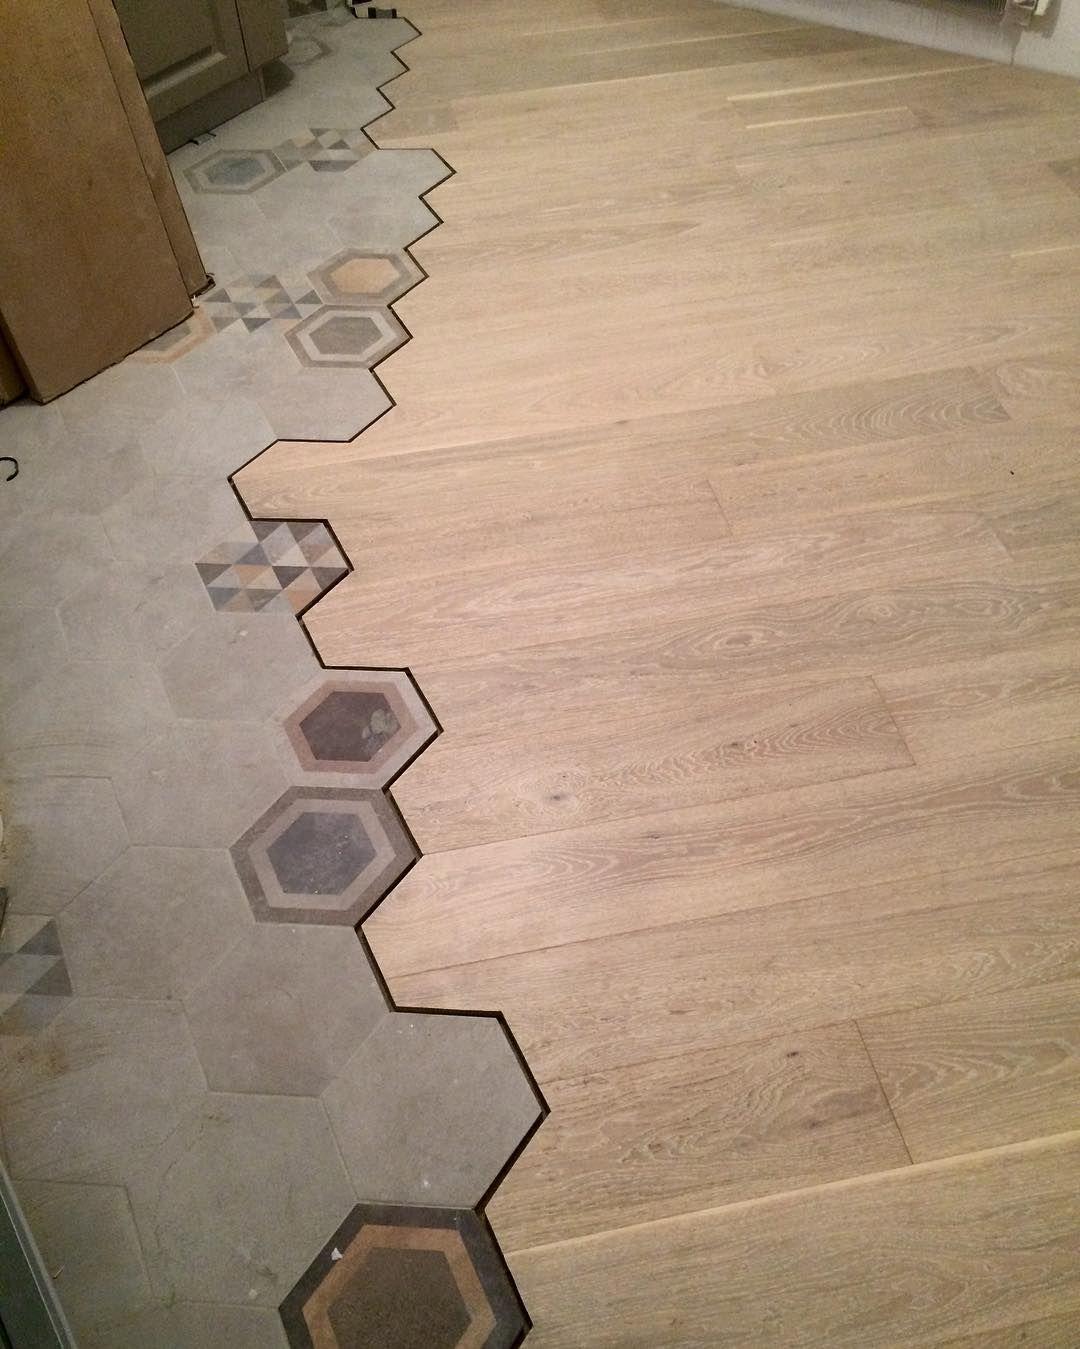 Hexagon Tiles Bathroom Floor Kitchen Creative Backsplash